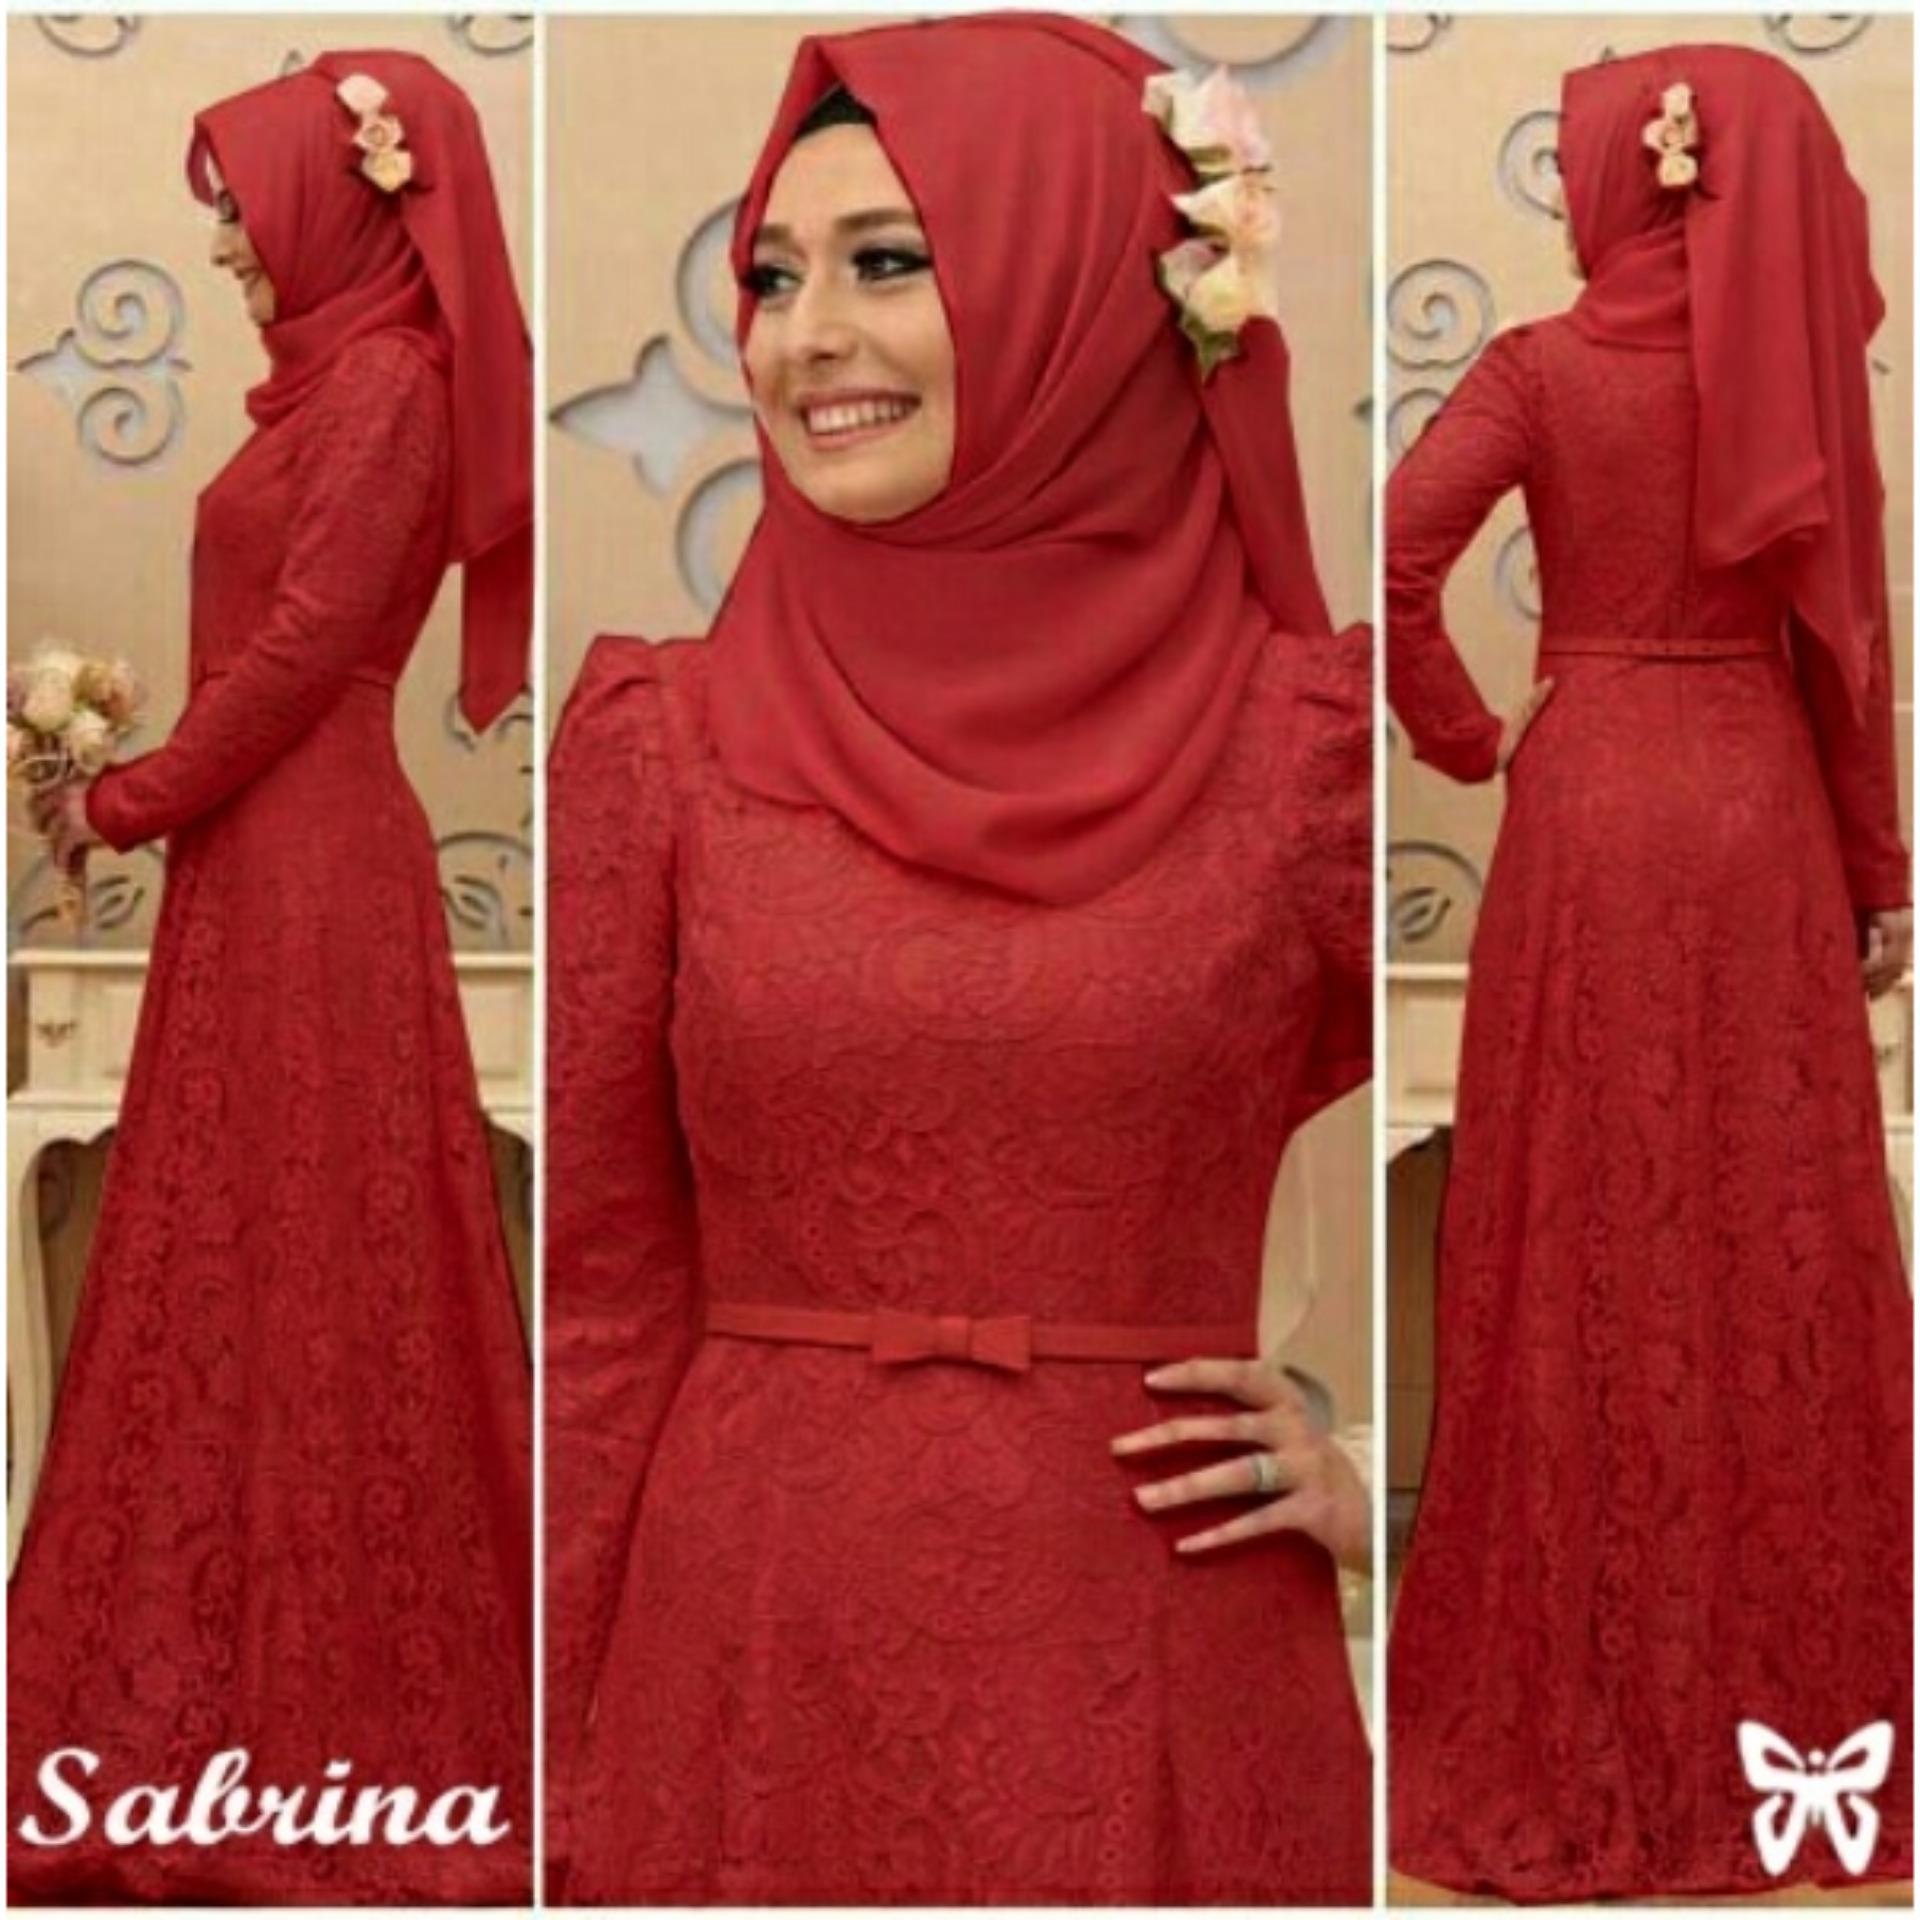 Kedai baju Set muslim / hijab murah berkualitas / Muslim Sabrina Maroon -